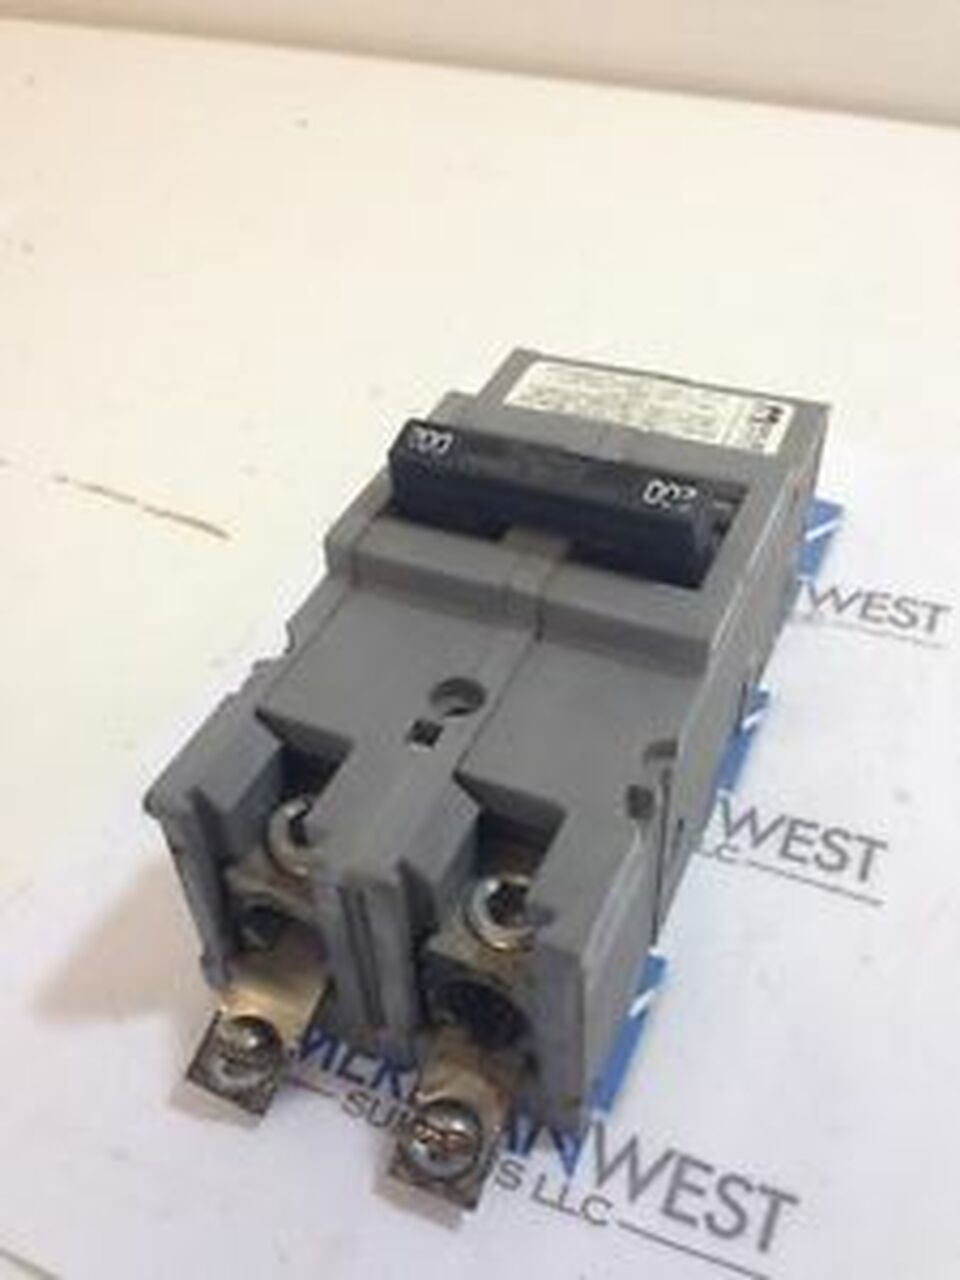 Milbank UQFP-100  100 AMP 2 Pole Circuit Breaker New Surplus